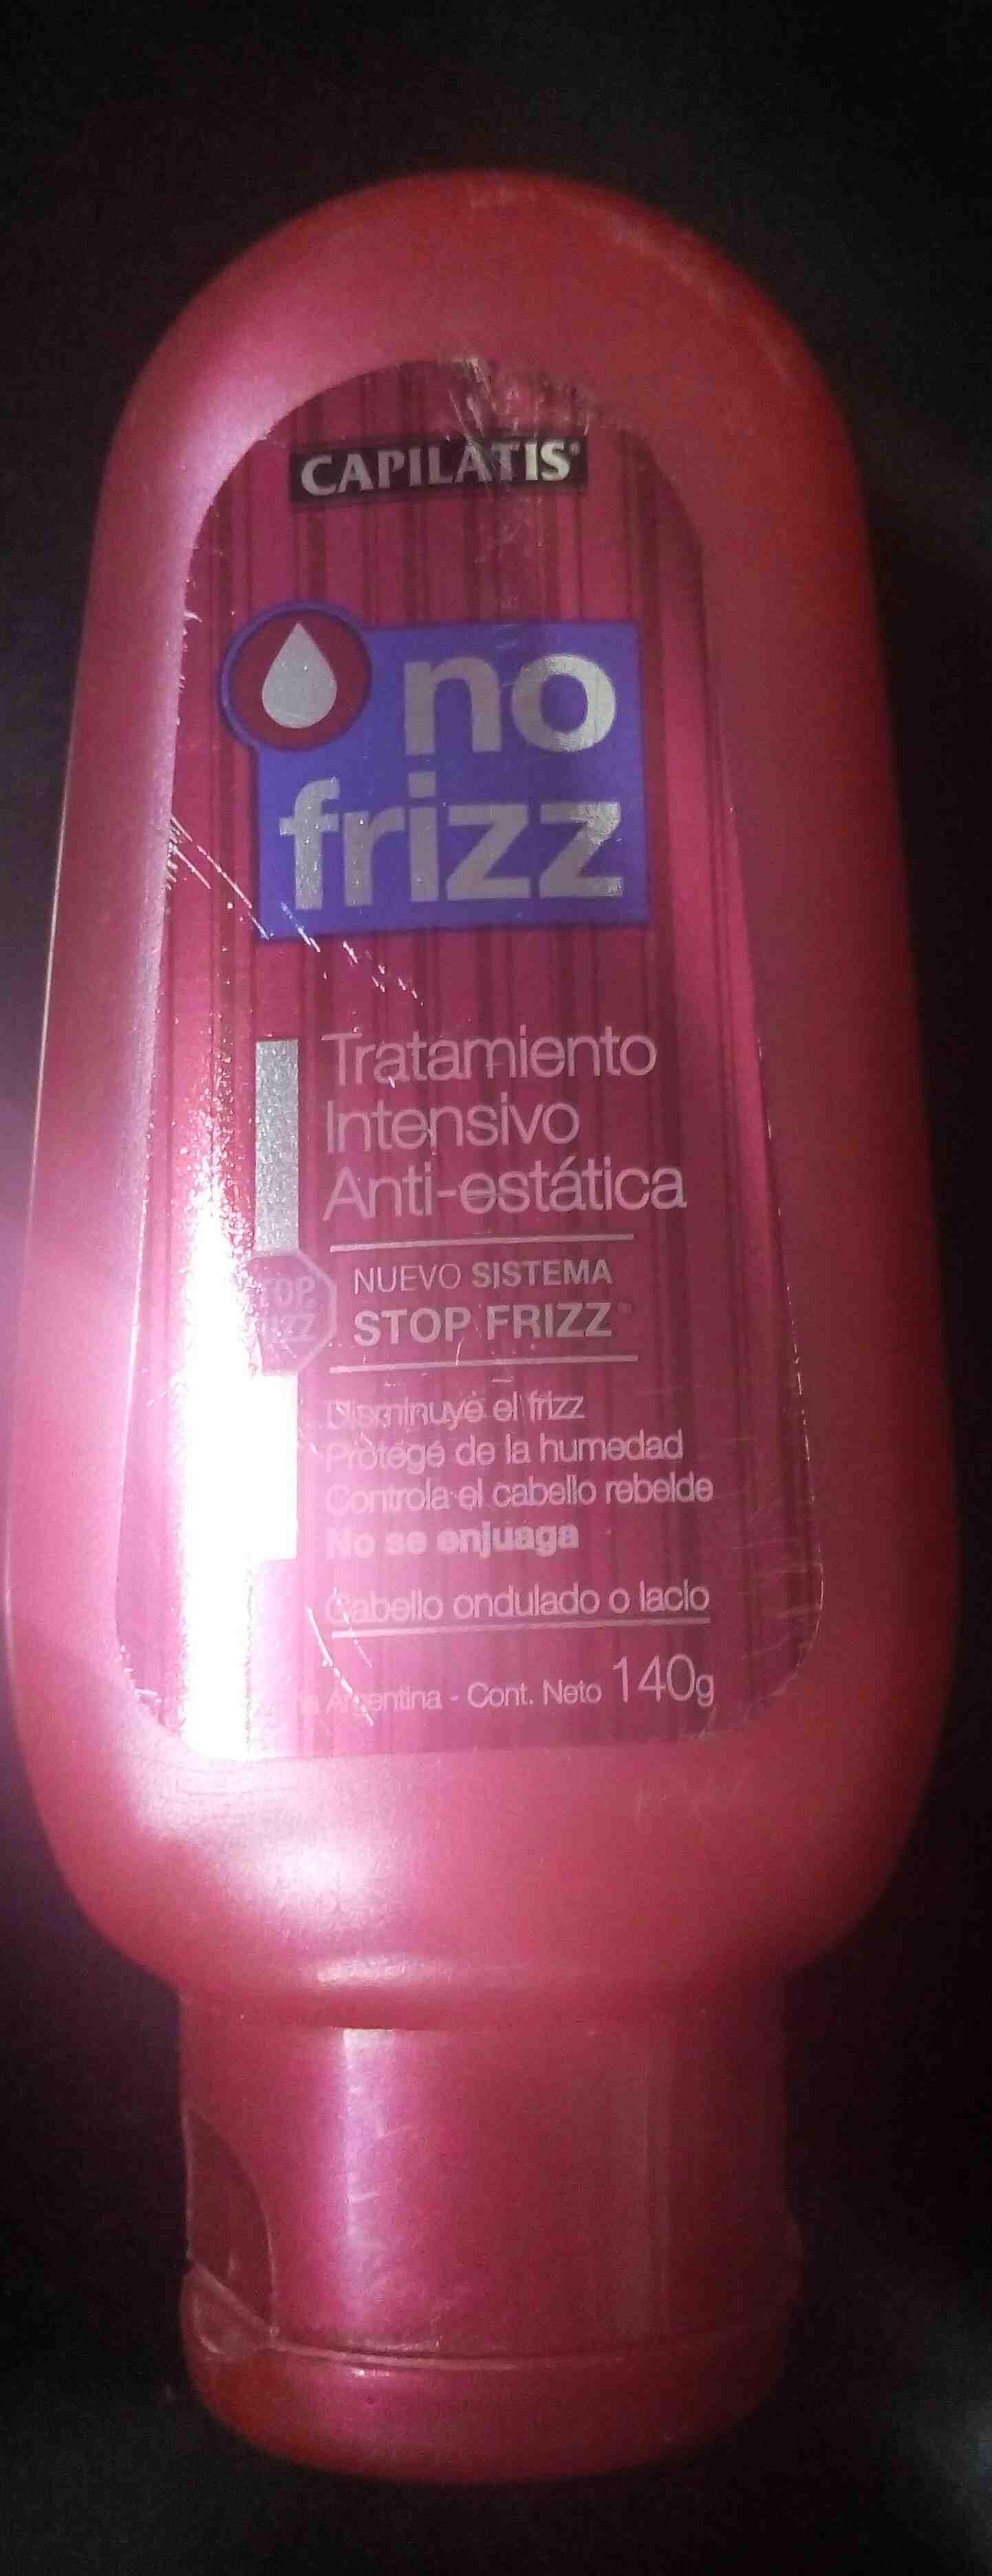 no frizz - Product - en